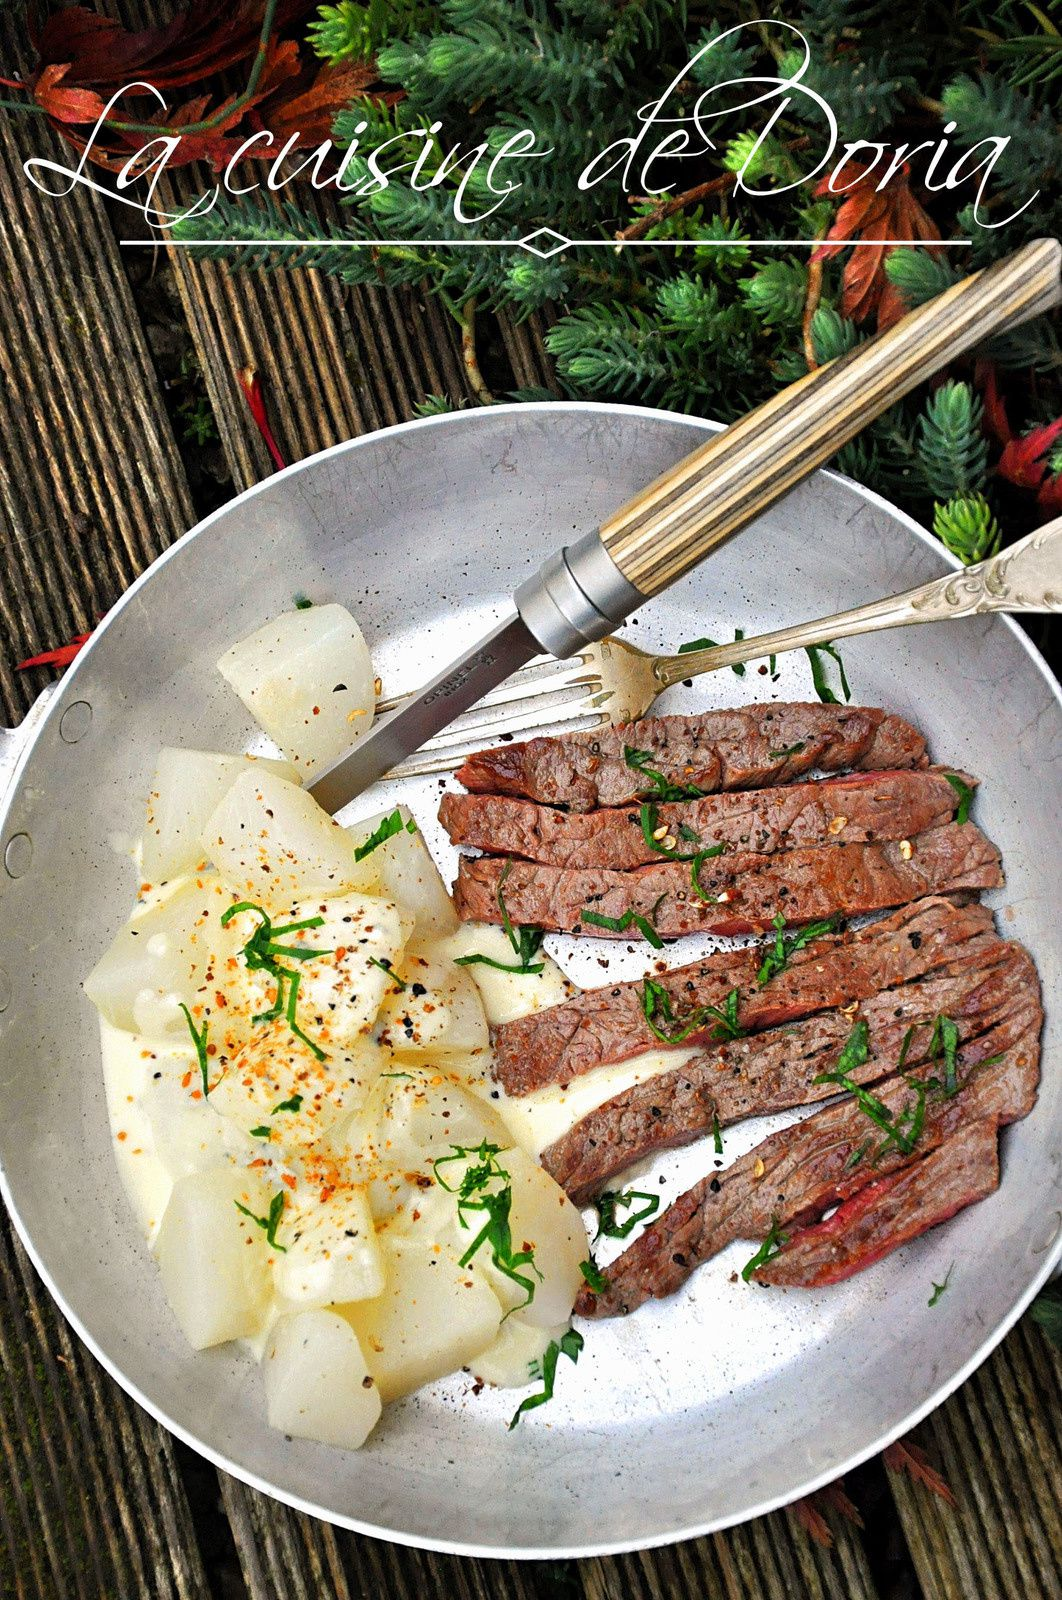 Steak, navets glacés et sauce gorgonzola